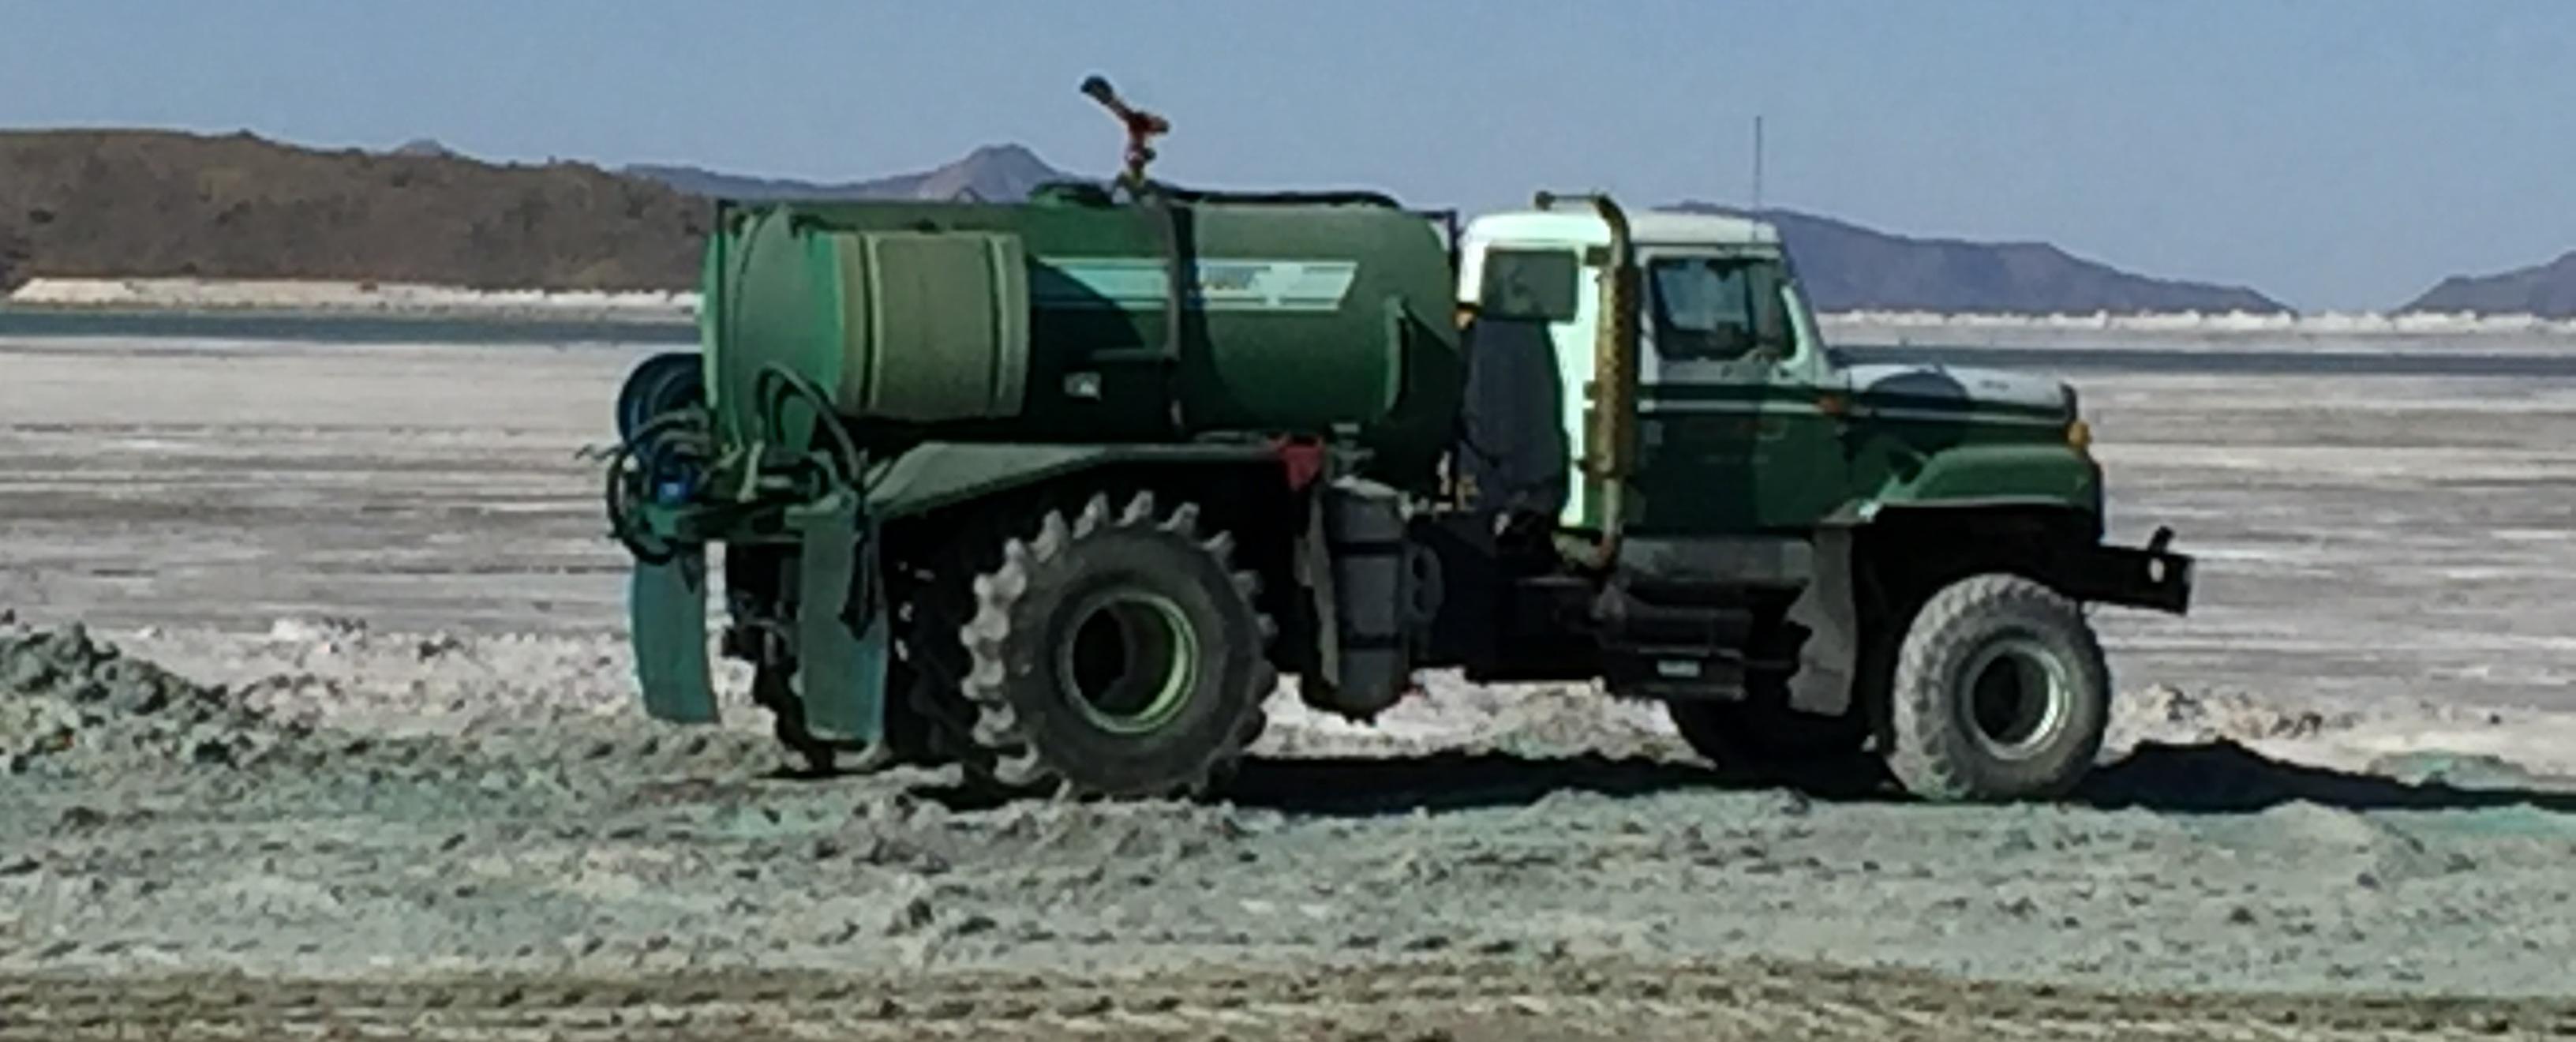 mine tailings soil stabilization equipment